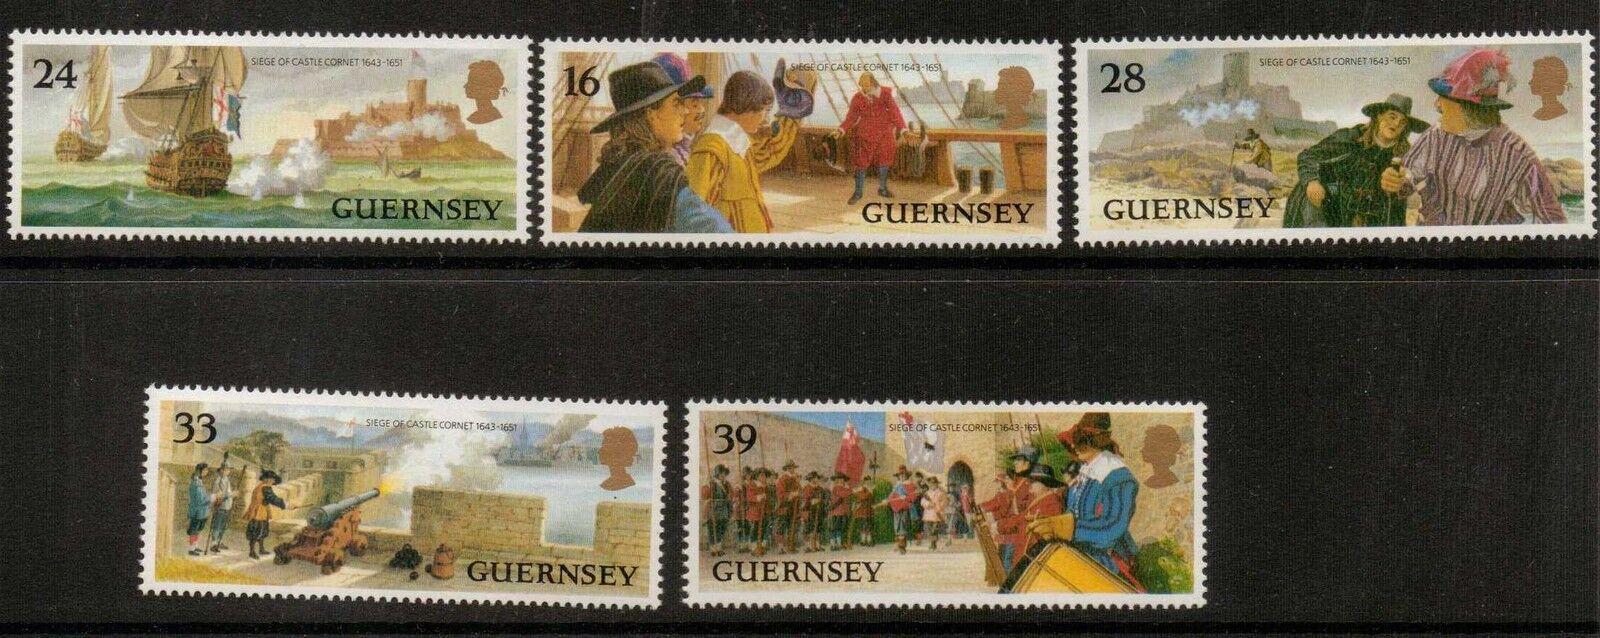 GUERNSEY SG611/5 1993 SIEGE OF CASTLE CORNET MNH